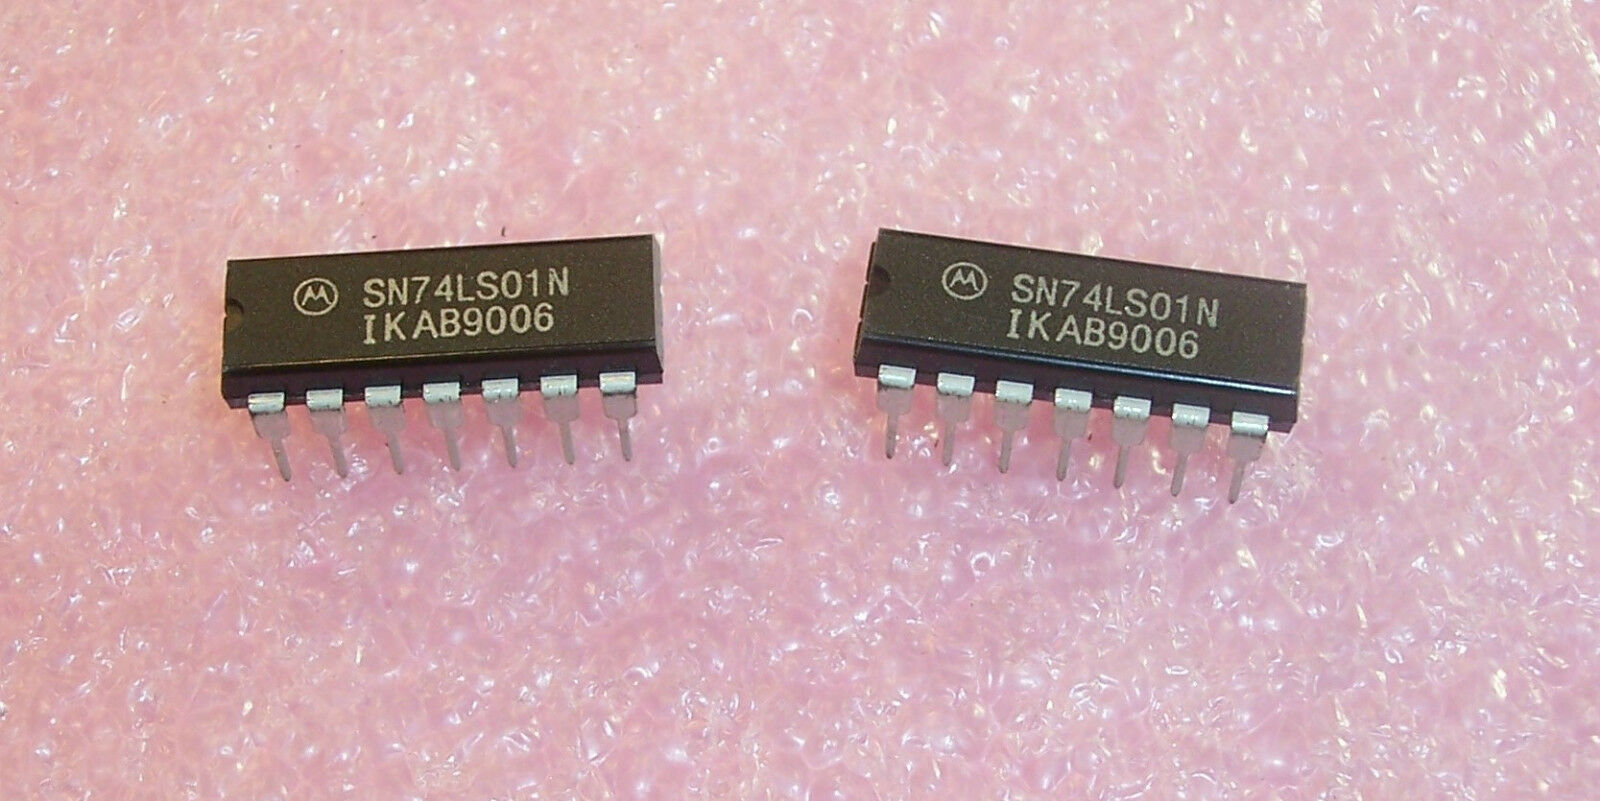 2 x sn74ls01n Quadruple 2-input Positive-NAND Gates with Open-TI dip-14 2pcs